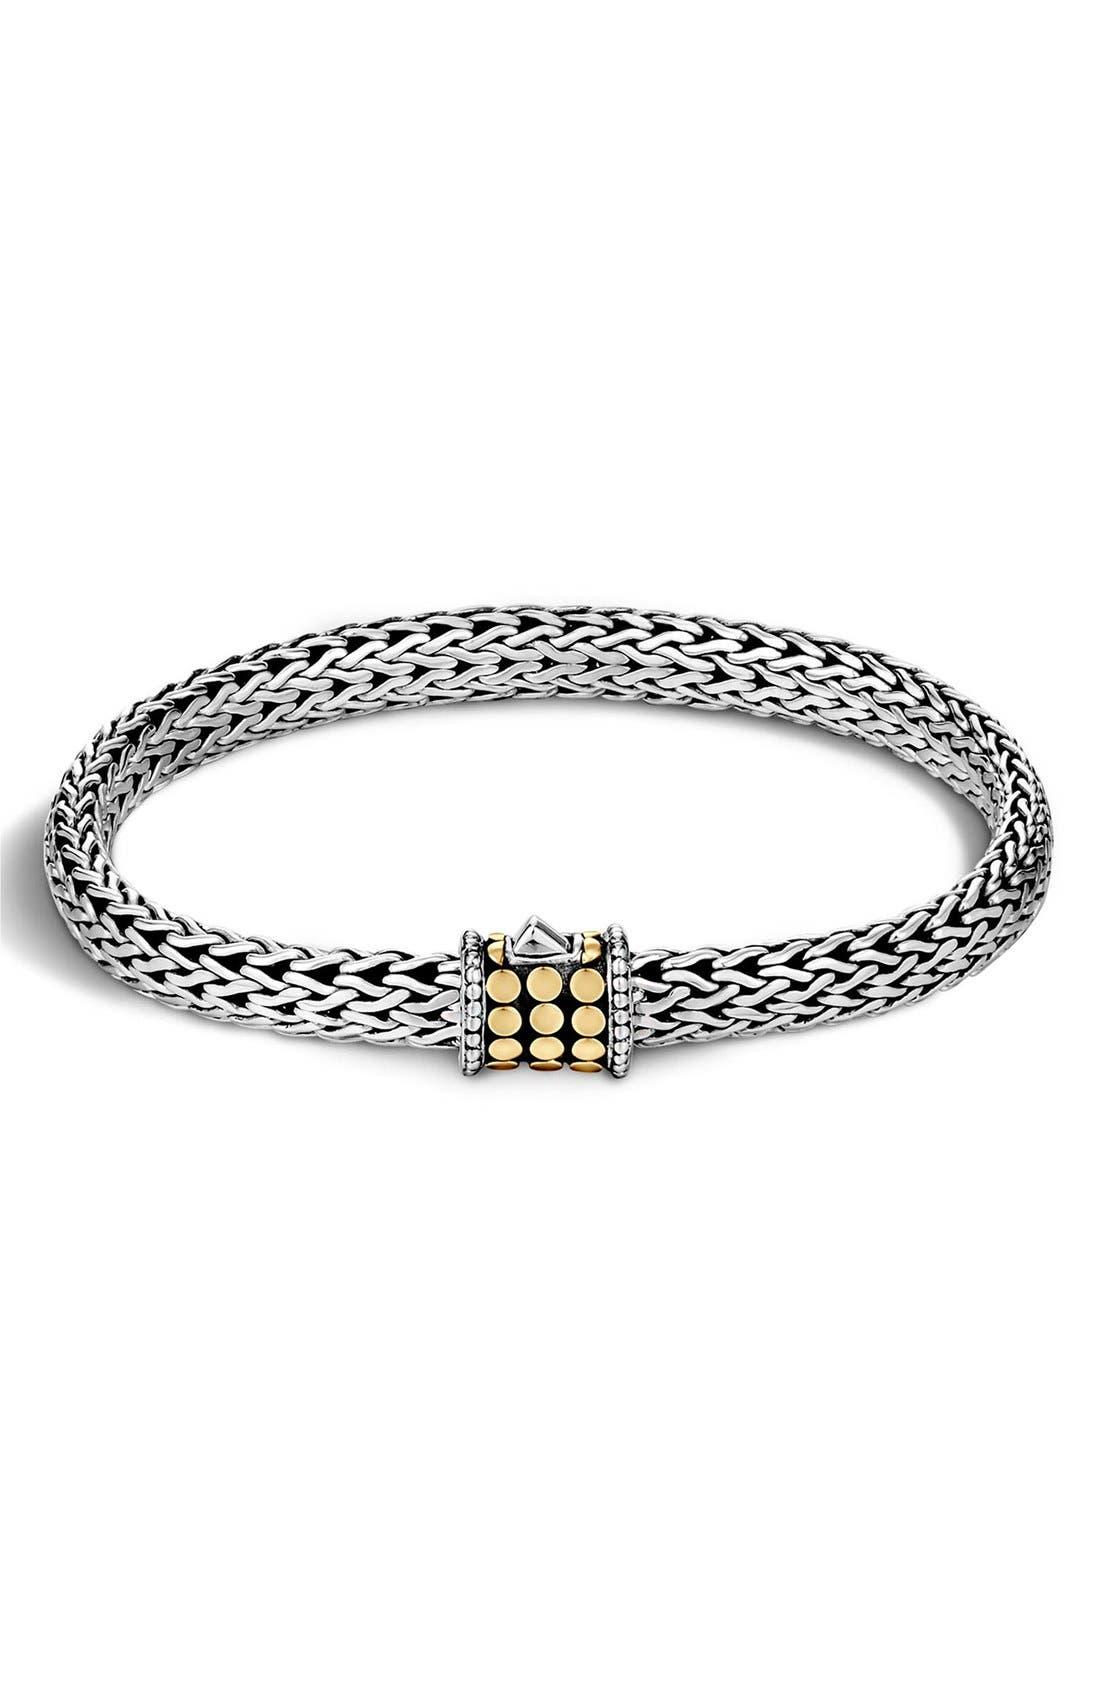 Main Image - John Hardy 'Dot' Small Bracelet